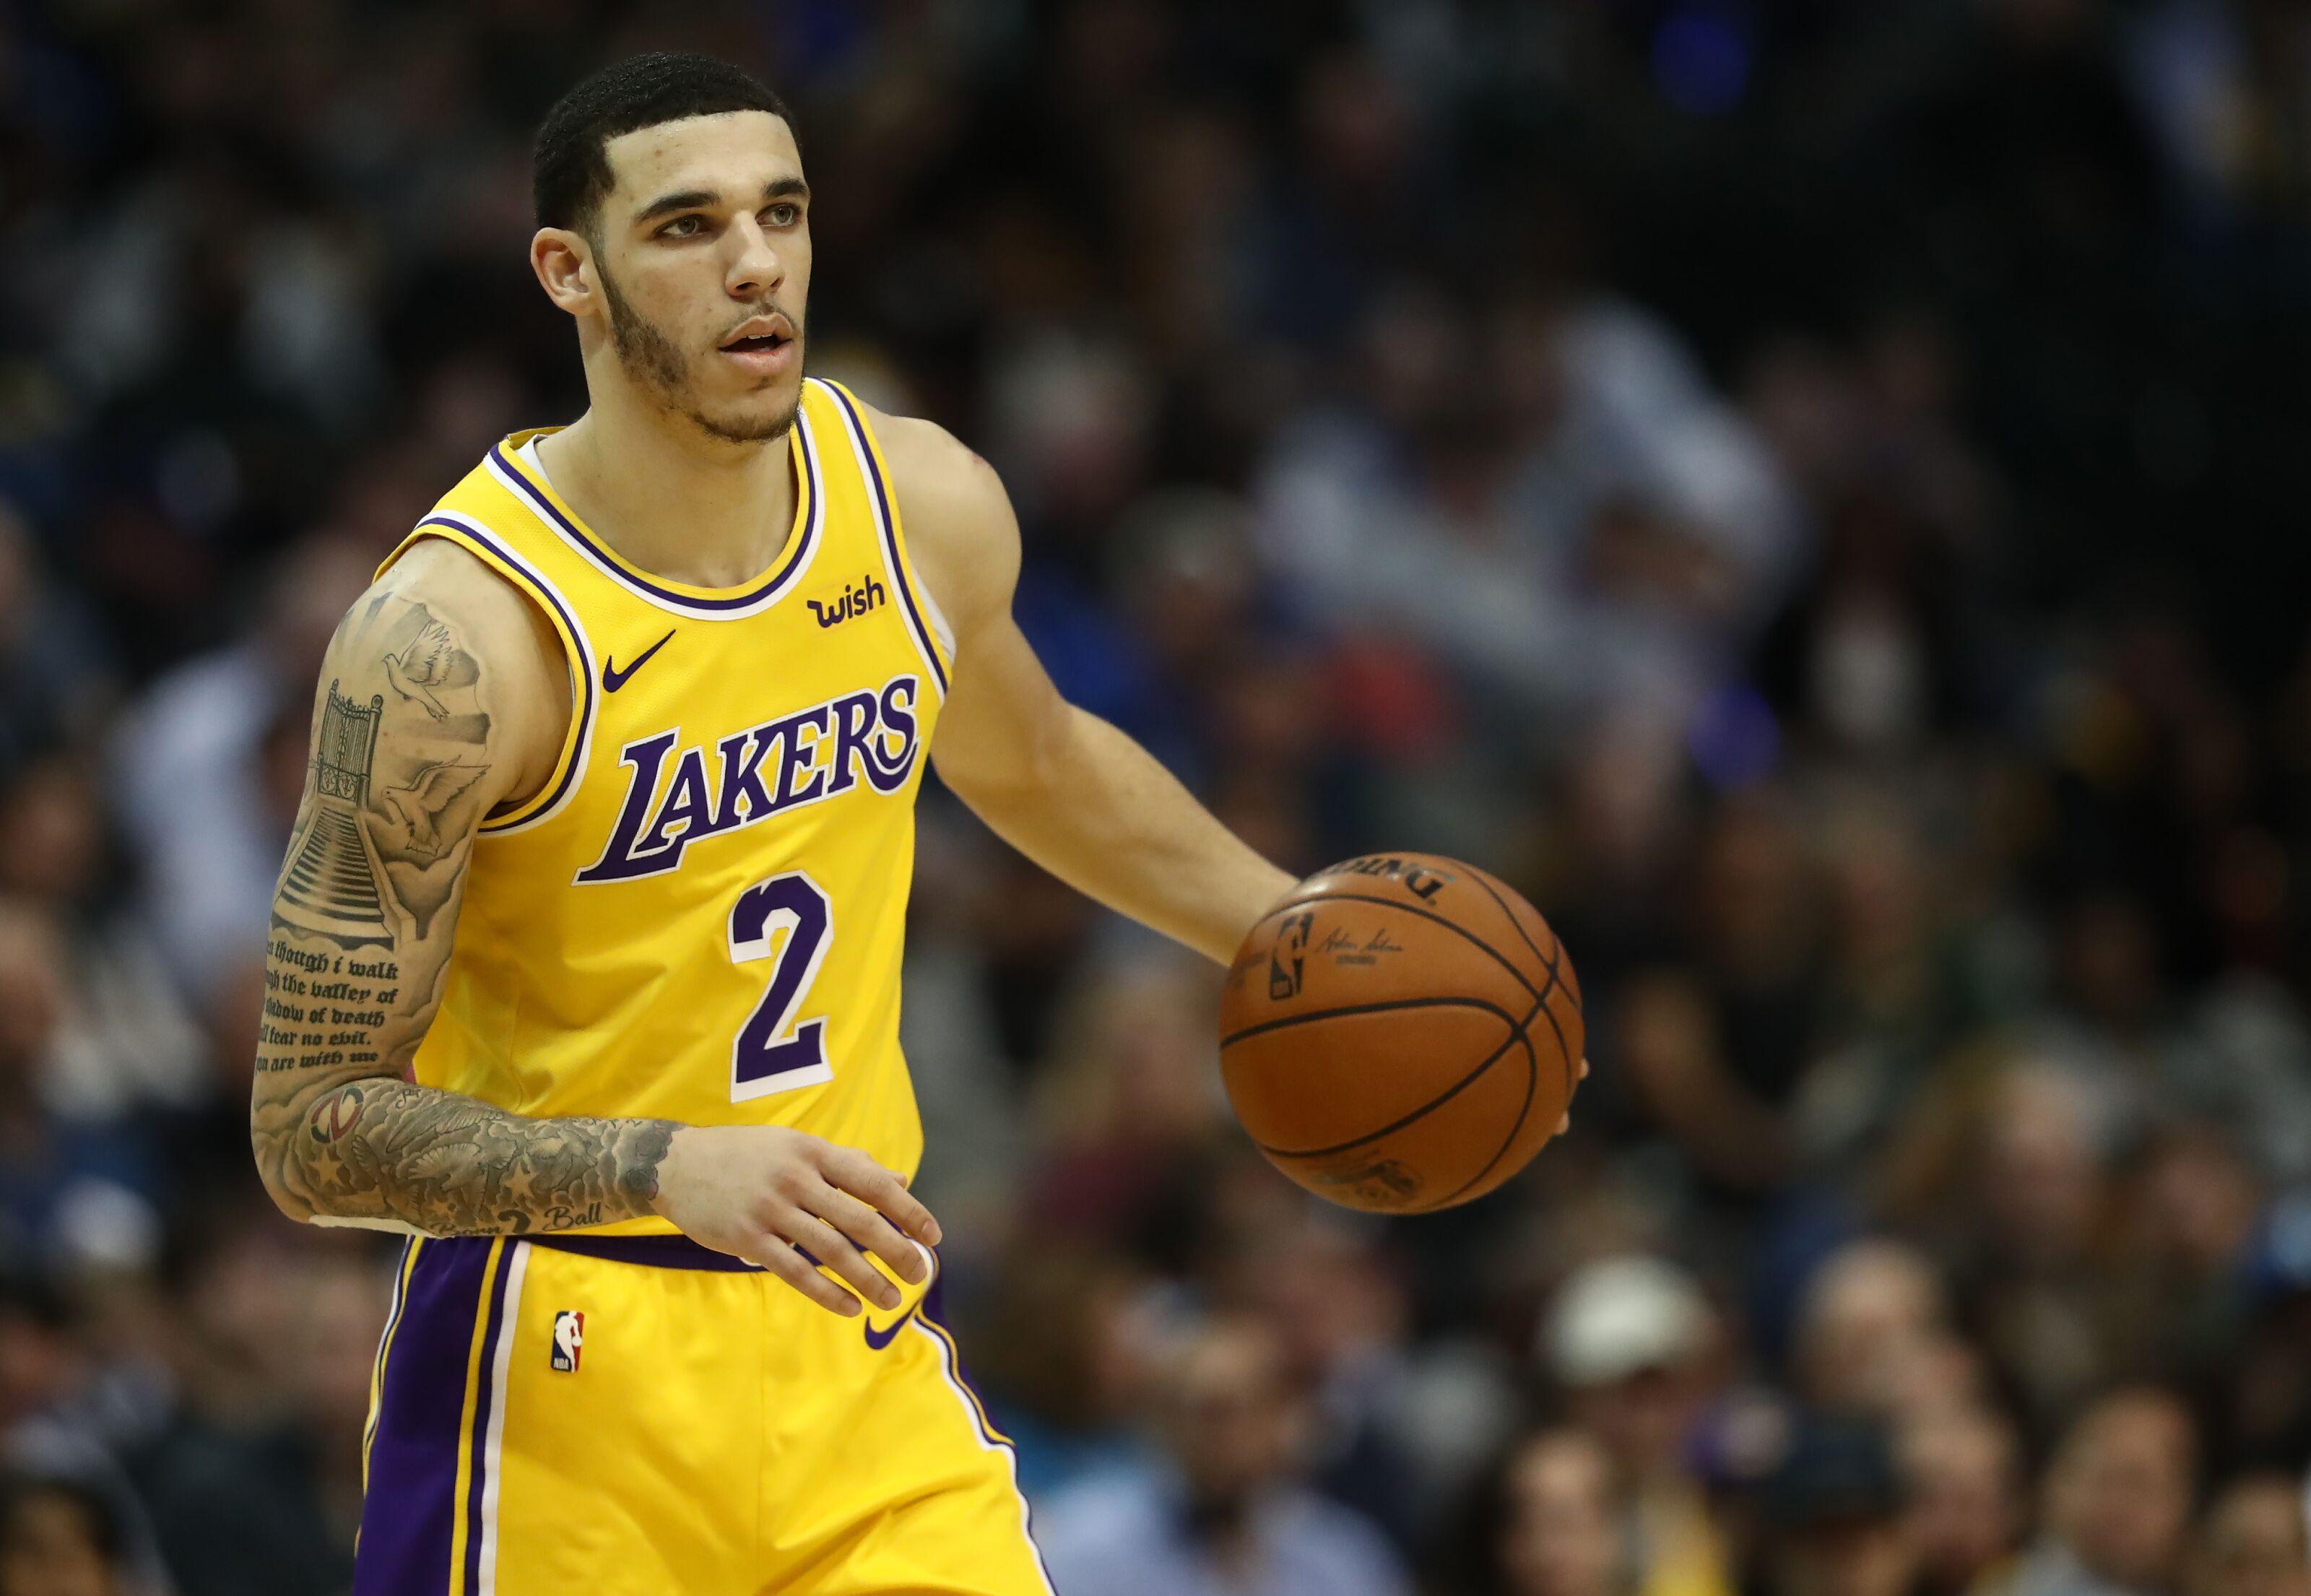 Los Angeles Lakers: LA should trade Ball, sign a big-name free agent PG